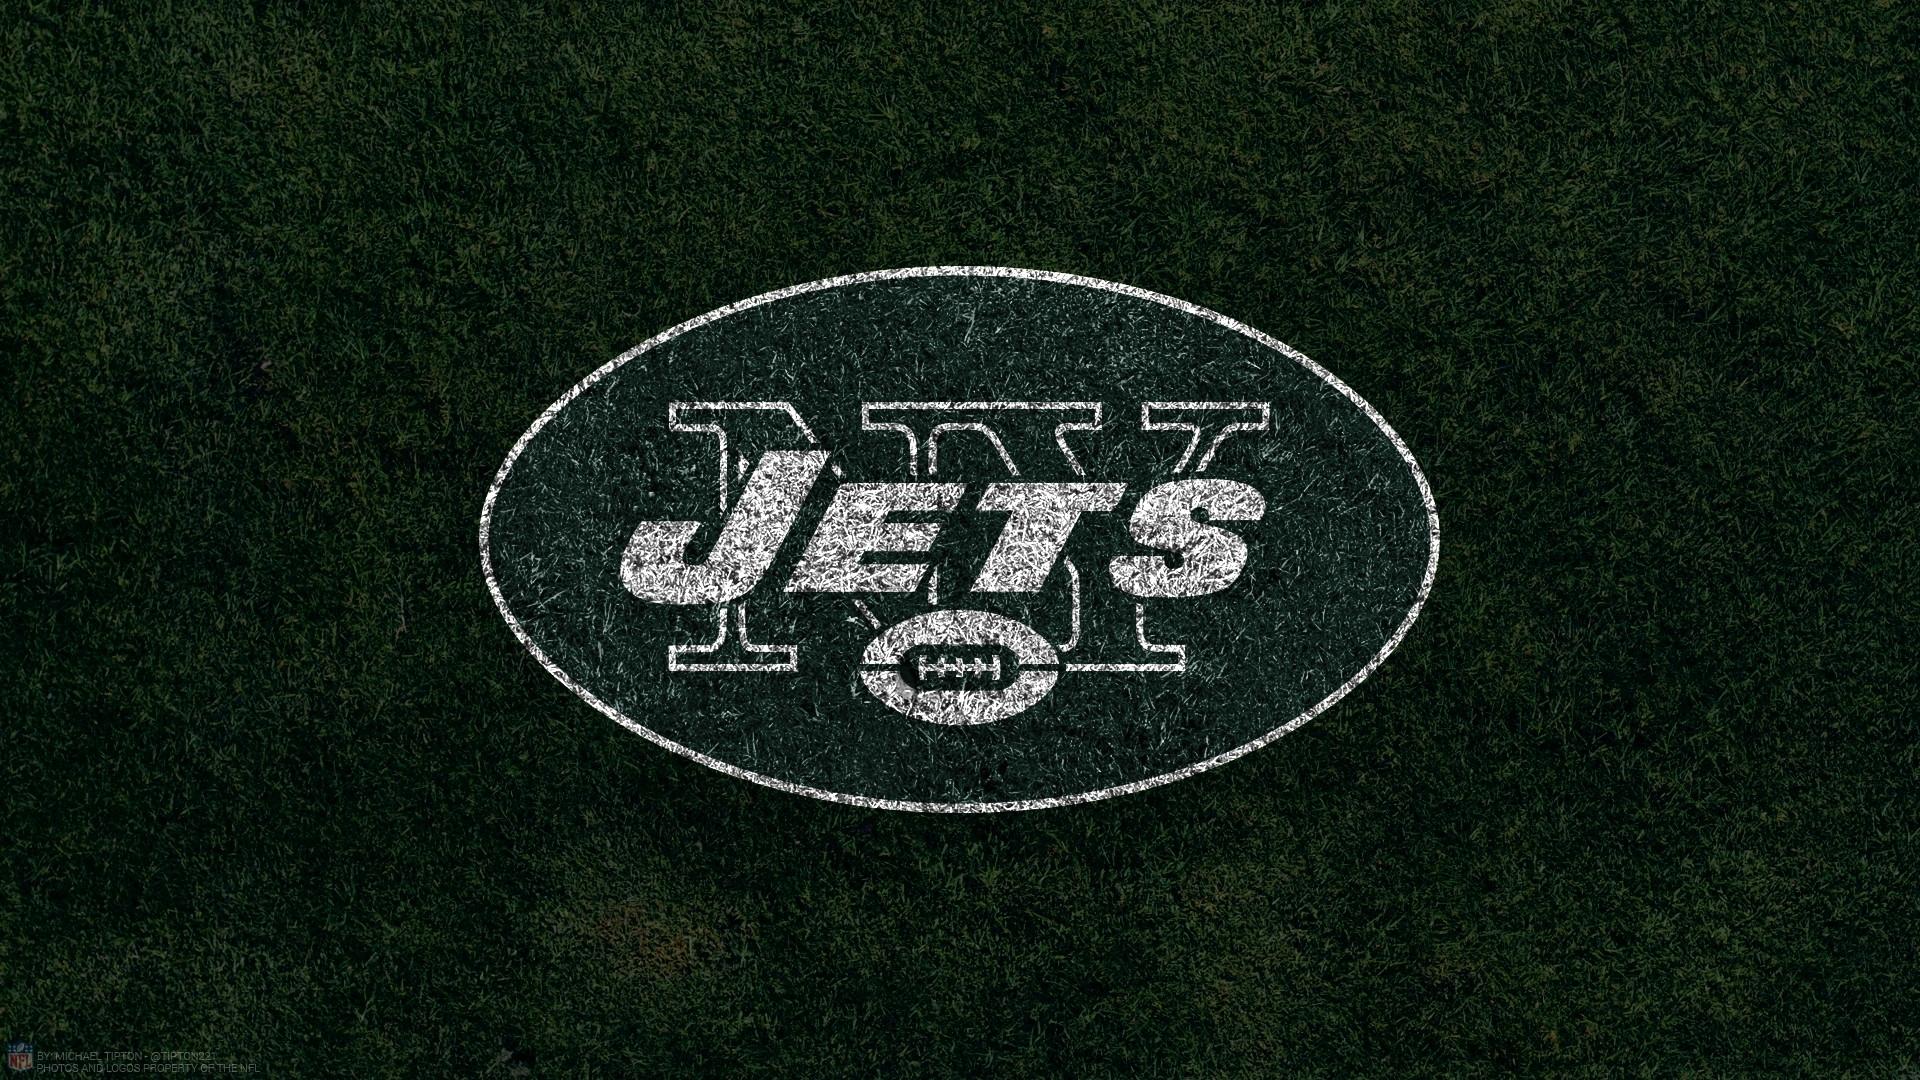 The new york jets logo font is nitro & turbo. 10 Best Ny Jets Logo Wallpaper FULL HD 1080p For PC ...